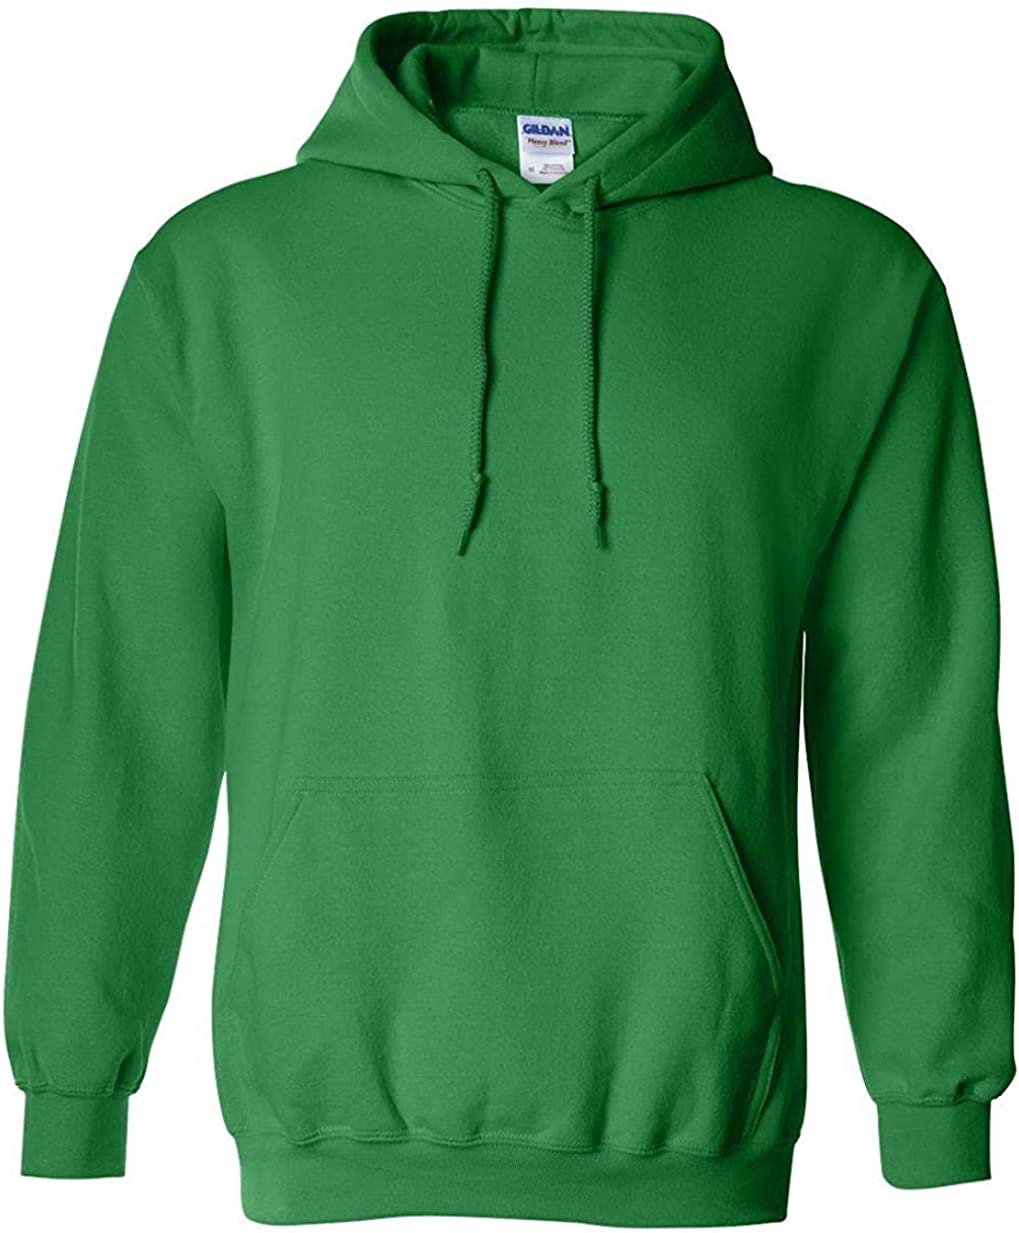 The Best Decor To Put On Sweatshirts